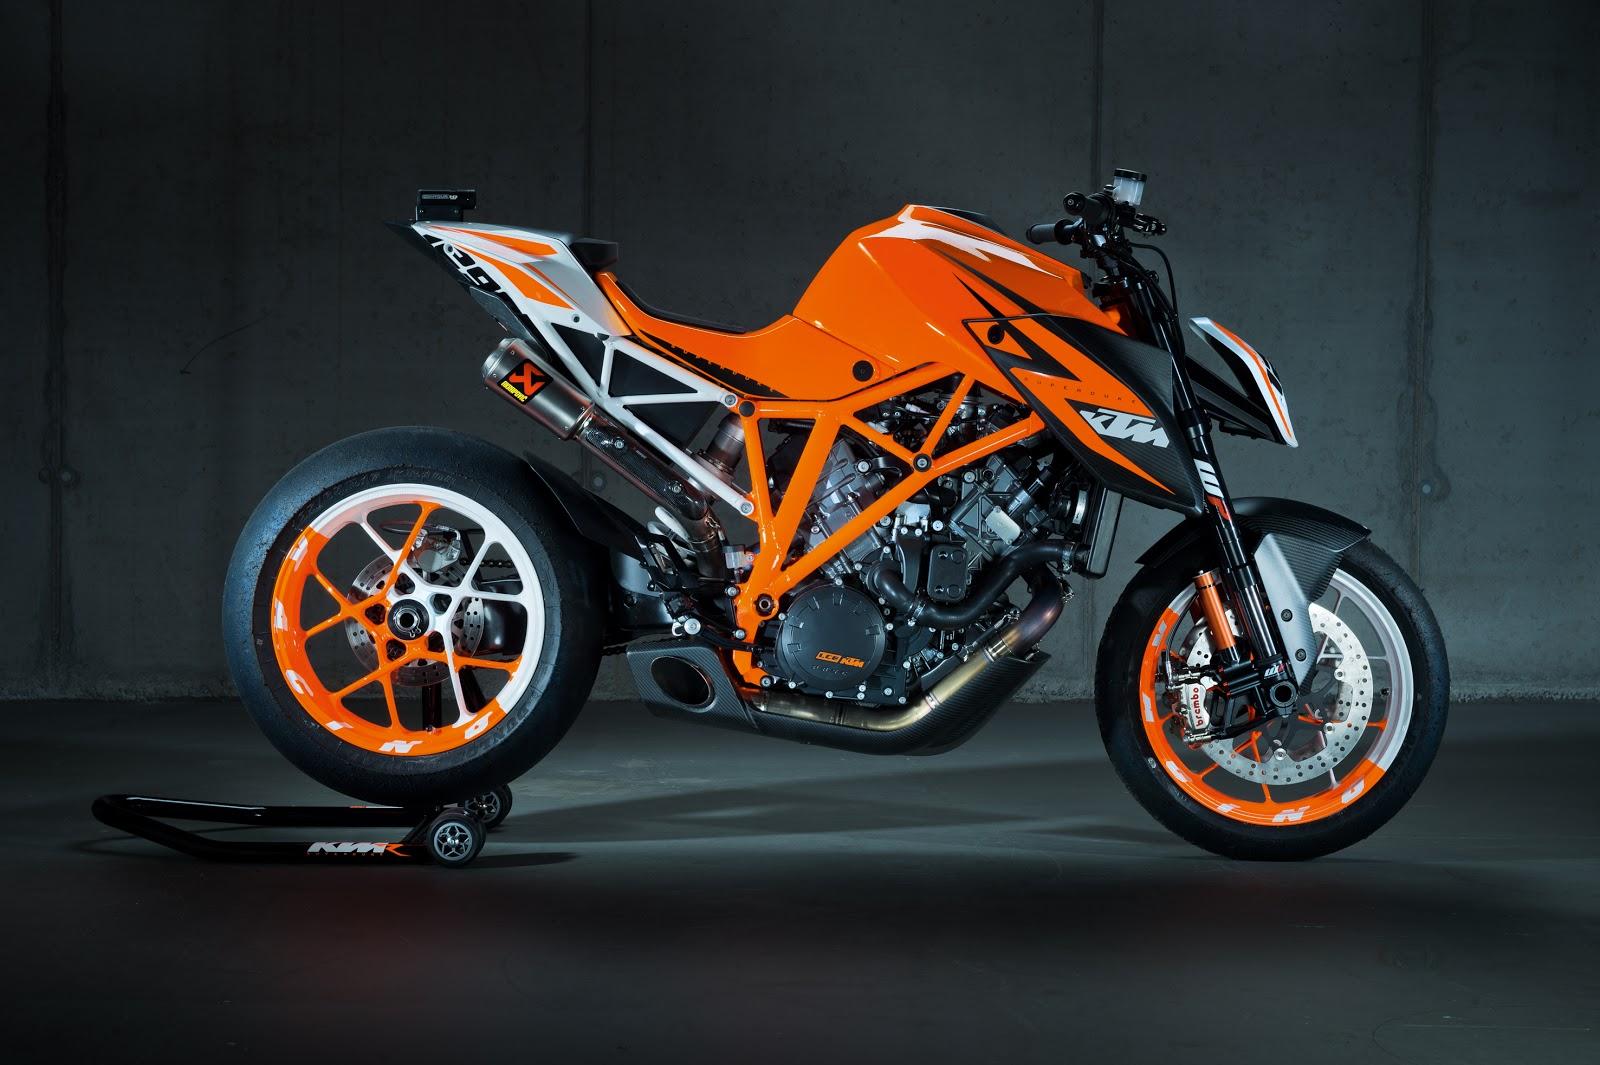 rm style moto passion 2013 ktm 1290 super duke r. Black Bedroom Furniture Sets. Home Design Ideas